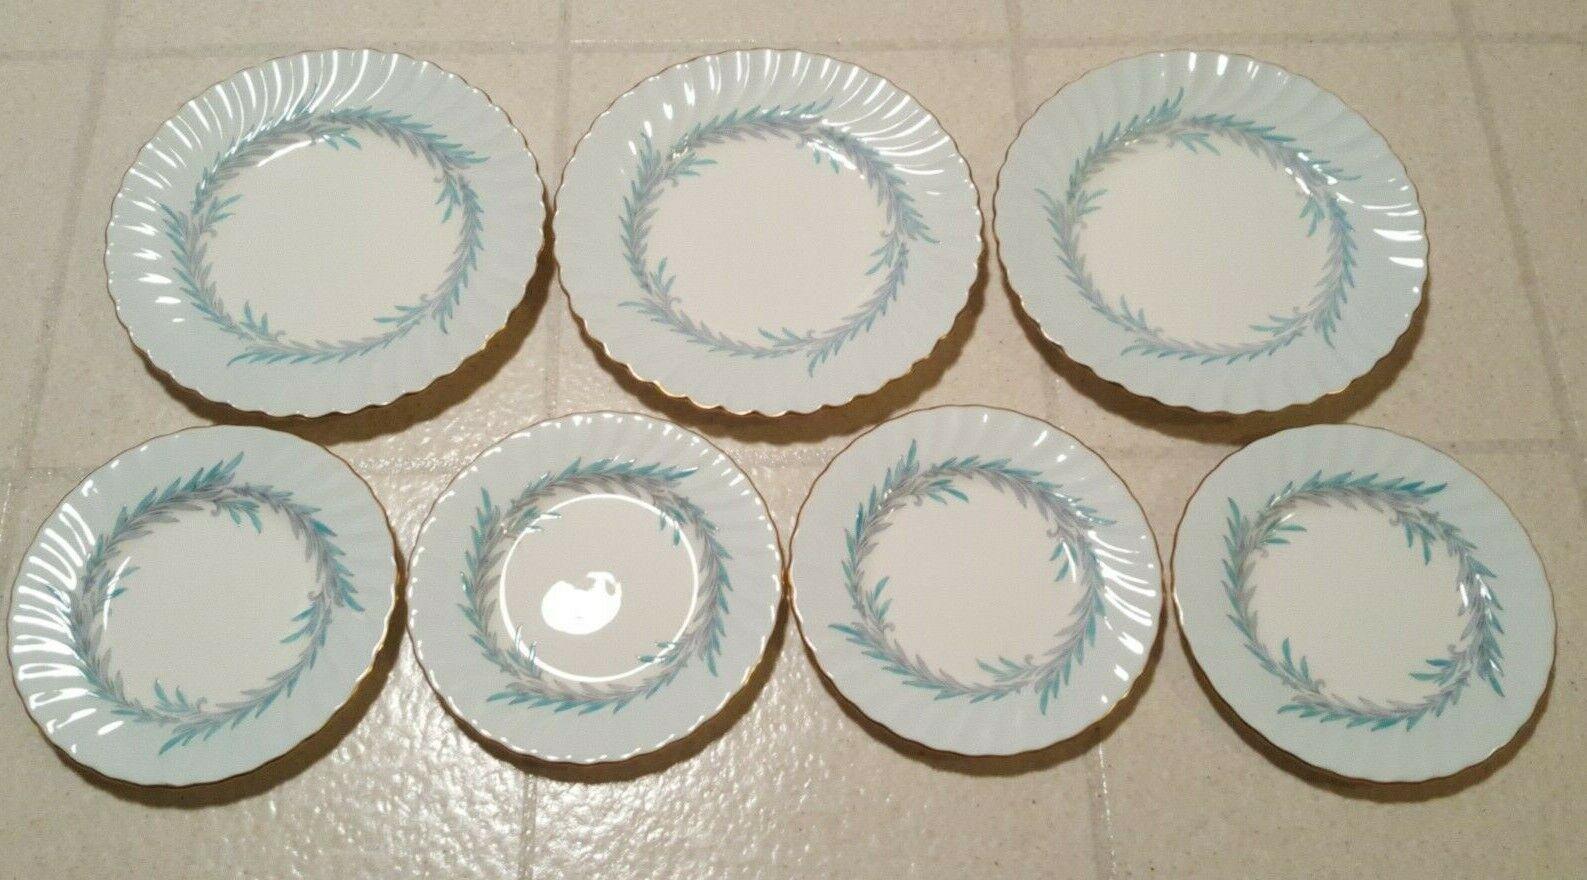 Minton Symphony Bread Dessert Plate Bone China S557 Salad Luncheon Plate 7 Piece - $29.95